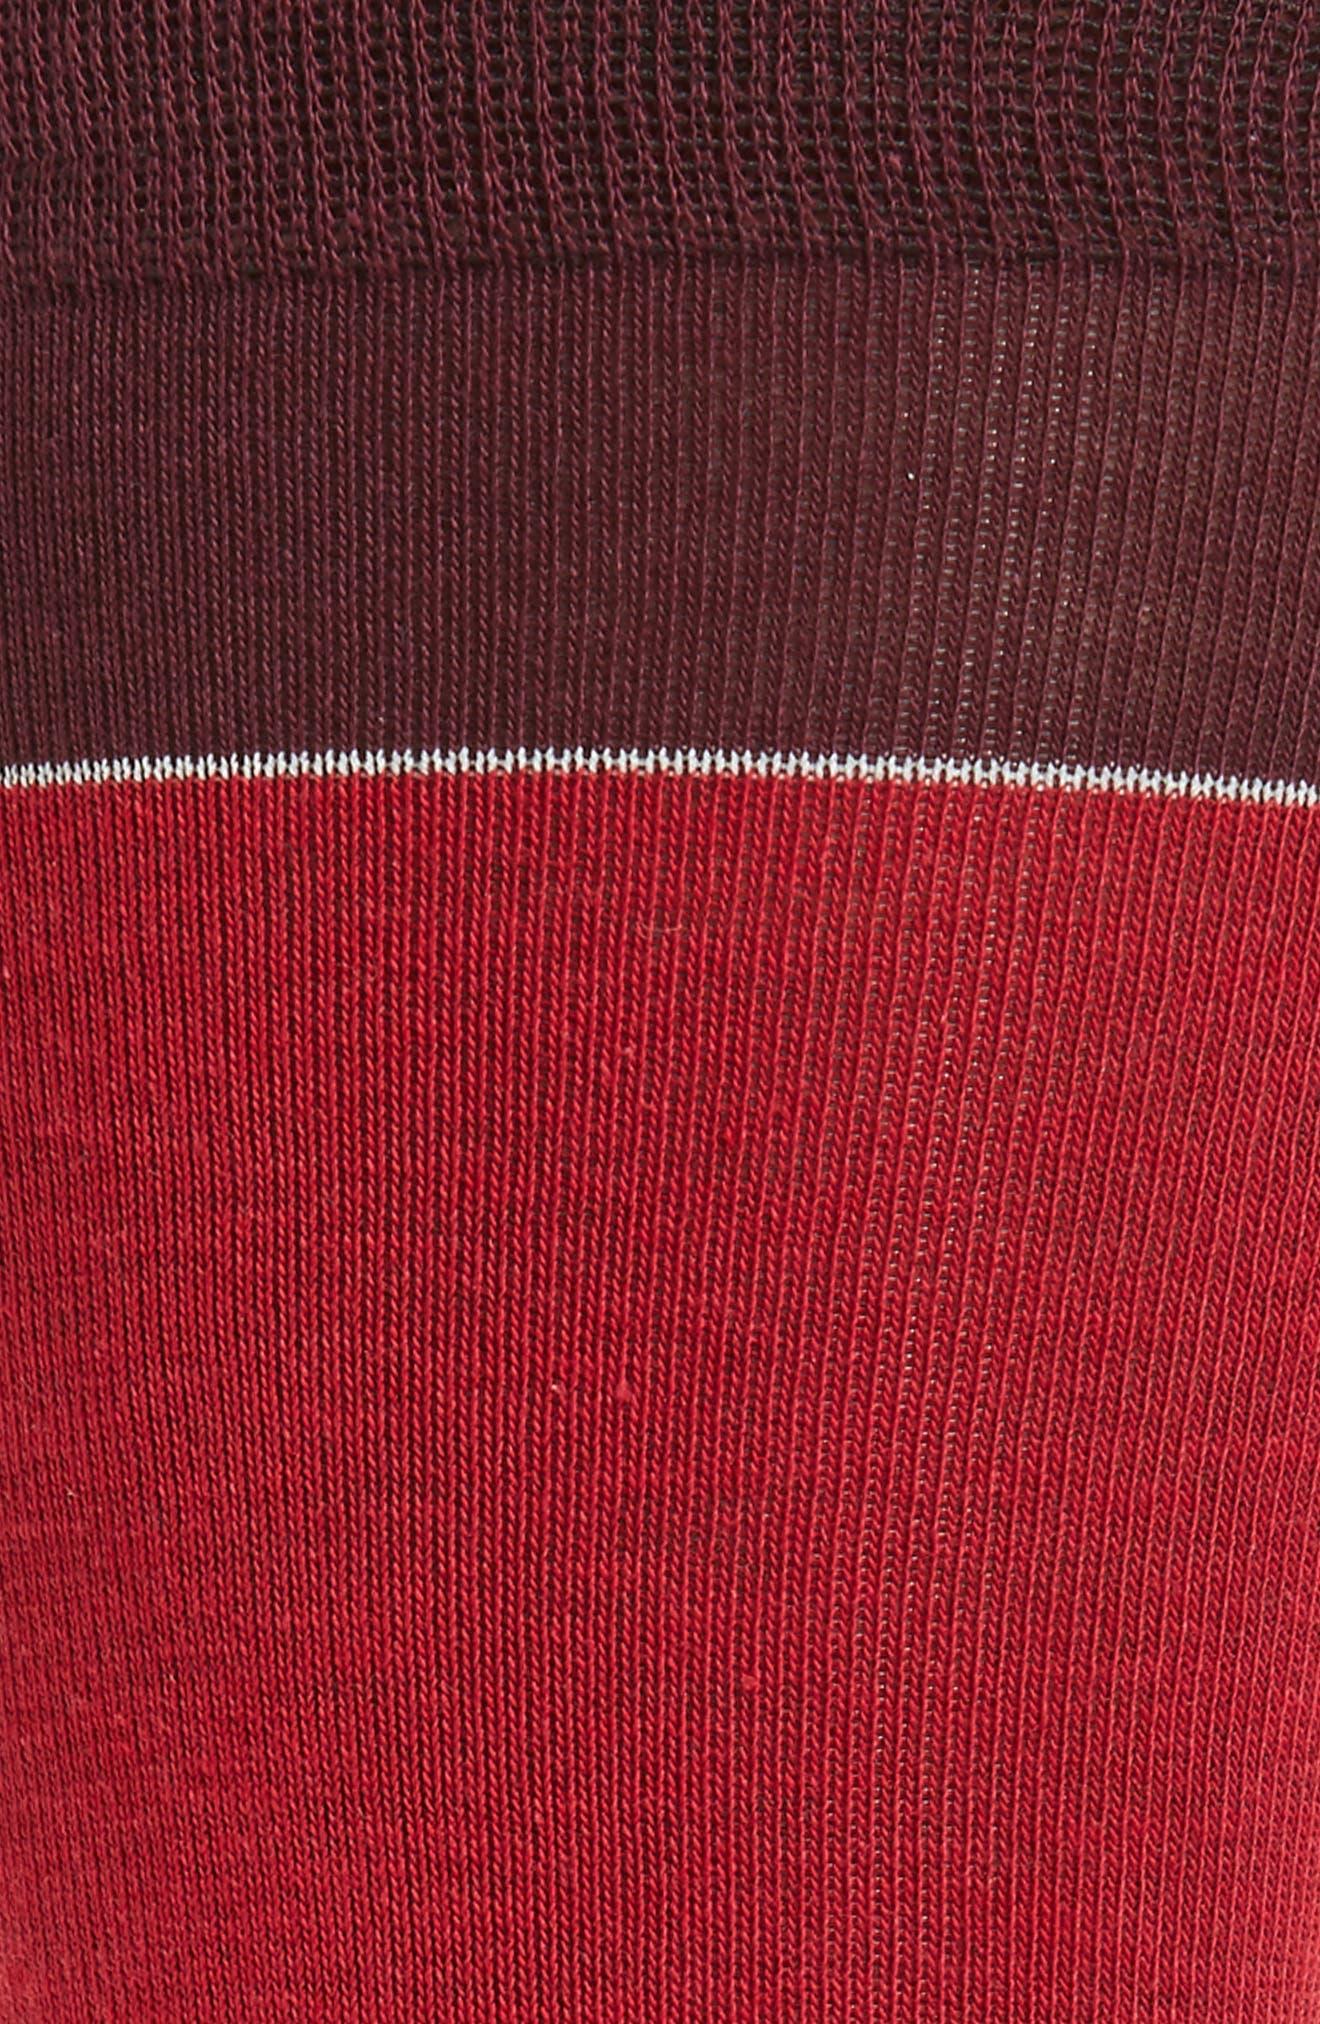 Stripe Socks,                             Alternate thumbnail 2, color,                             Graphite Heather/ Red